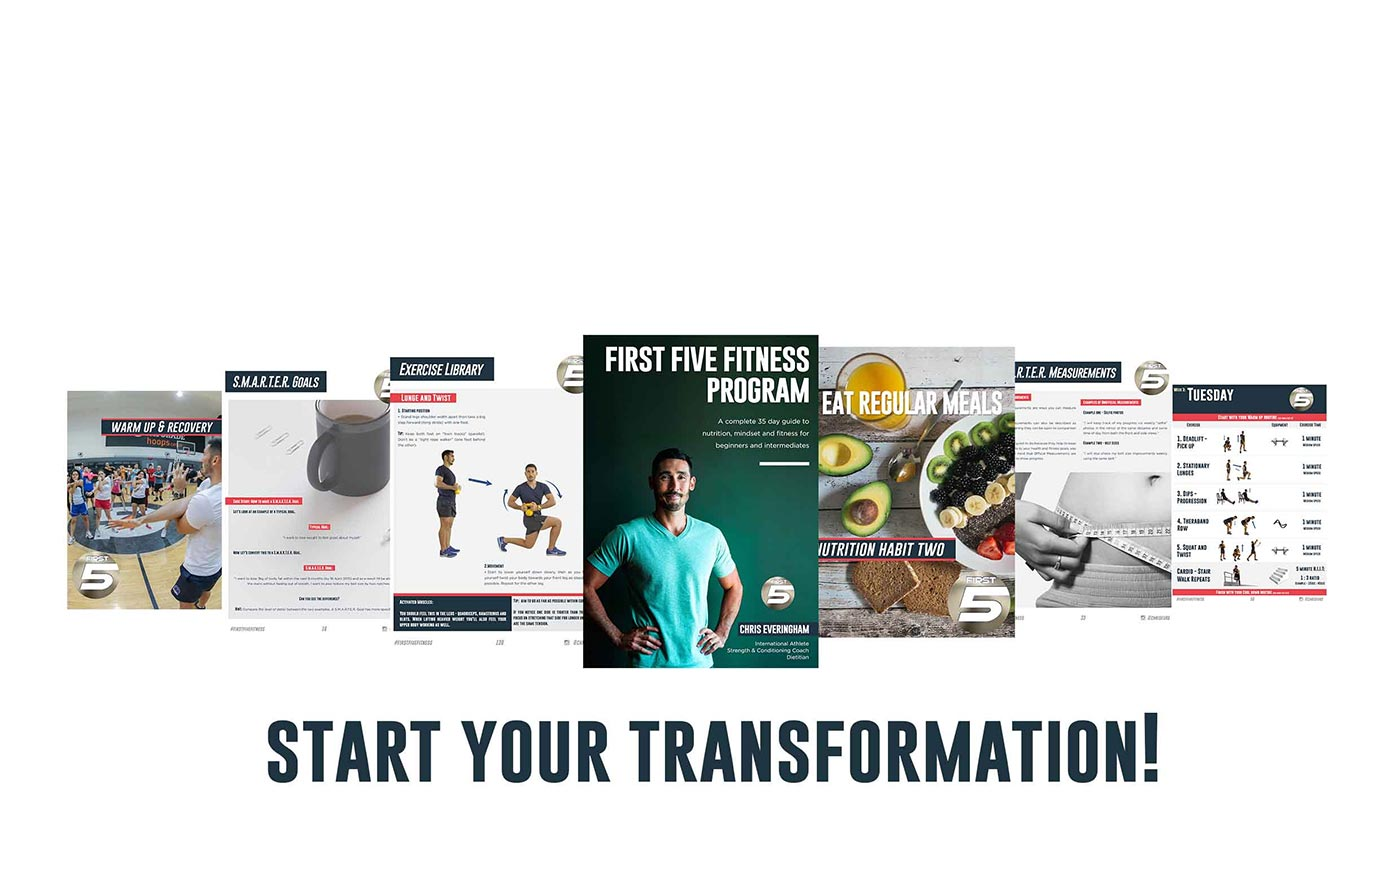 Start Your Transformation